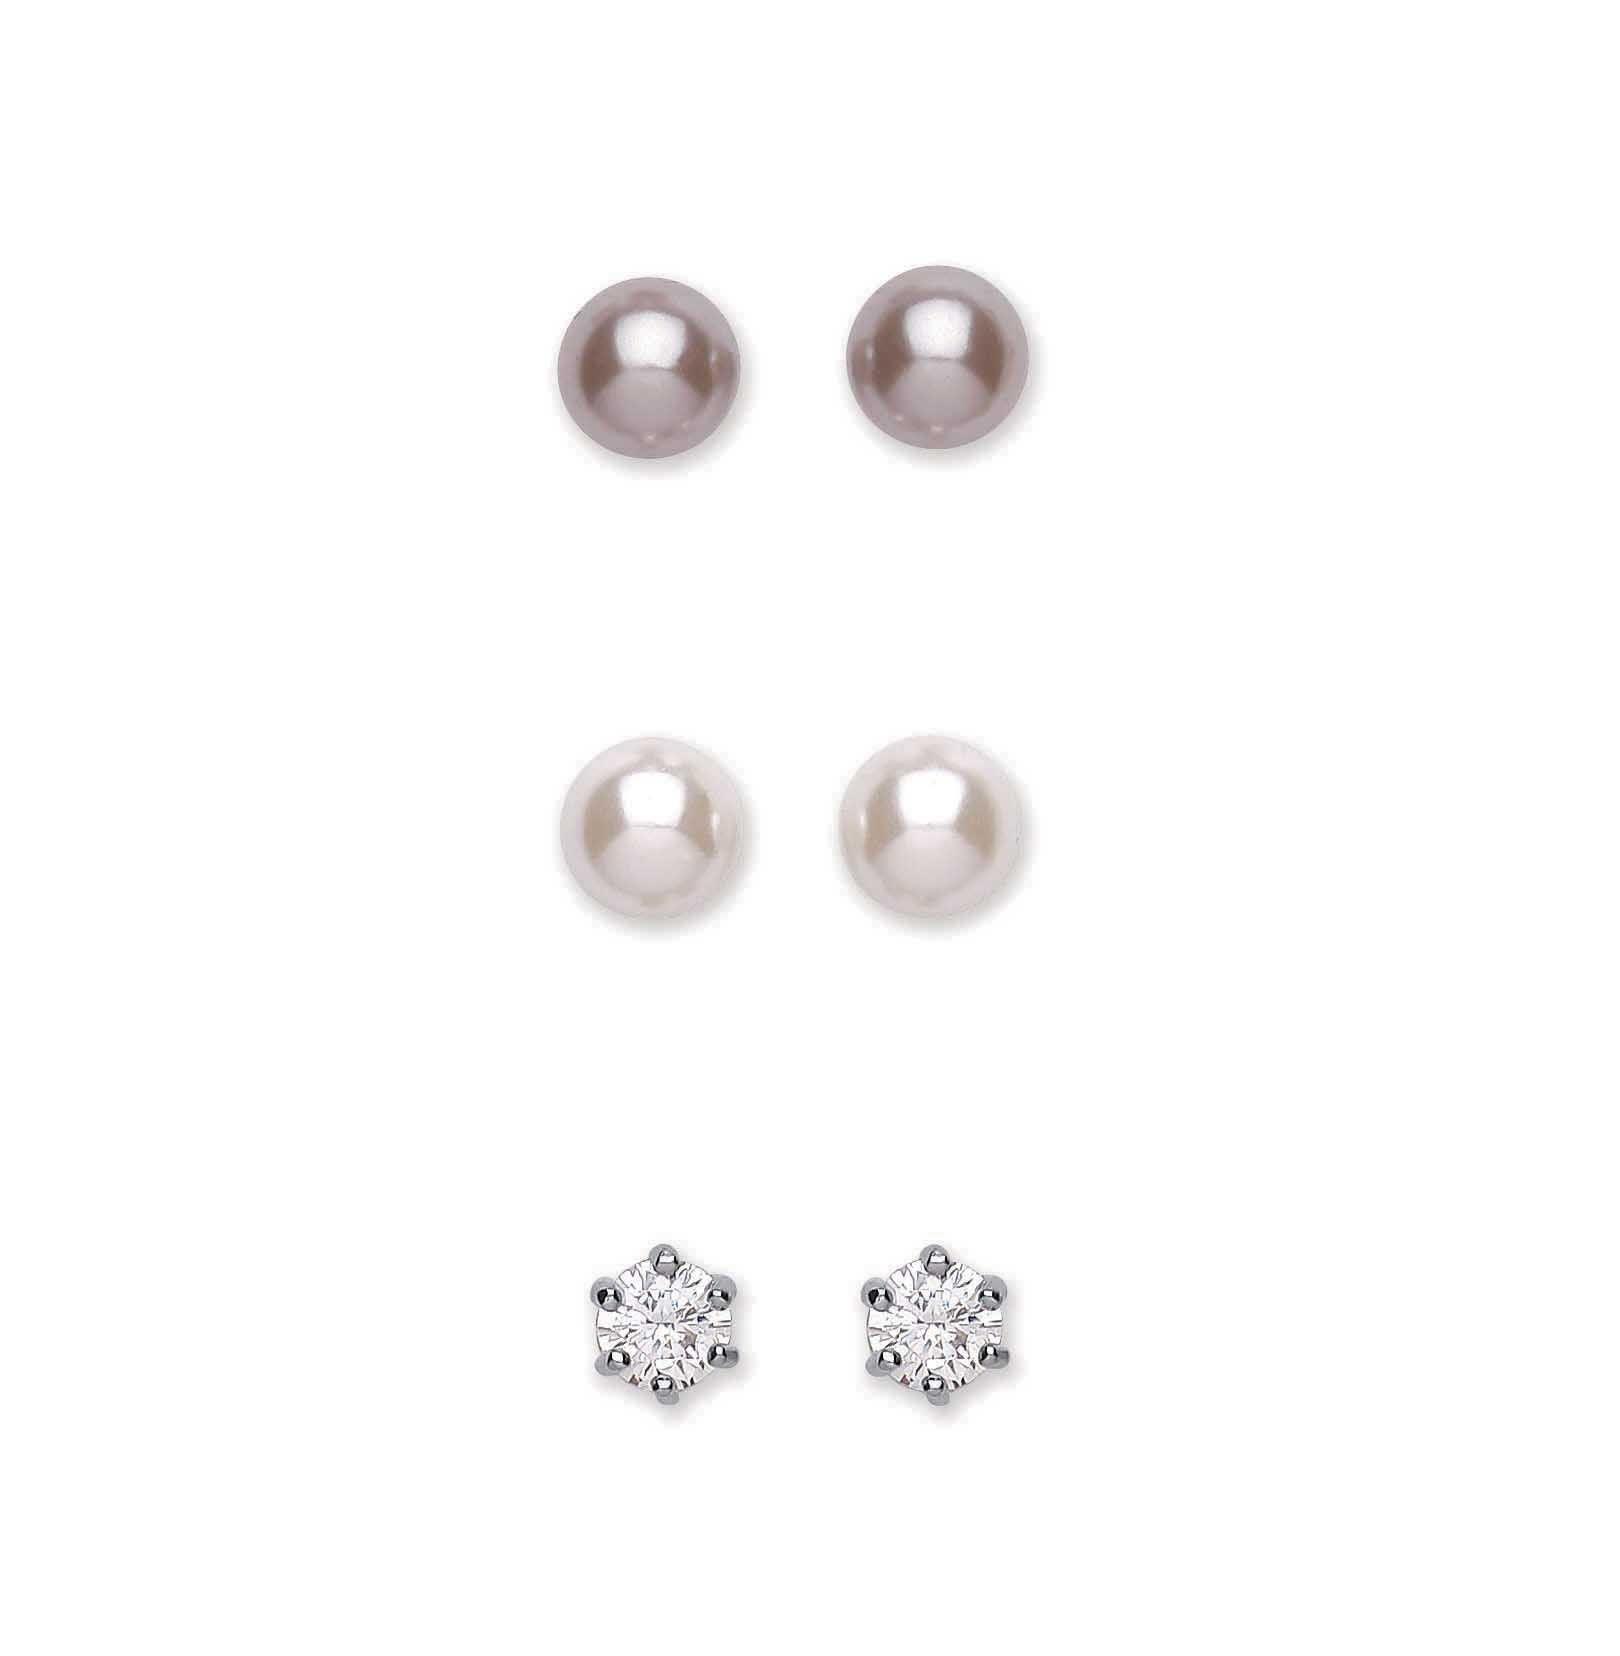 Rhodium Plated Clear Crystal / Pearl Trio Stud Earring Set